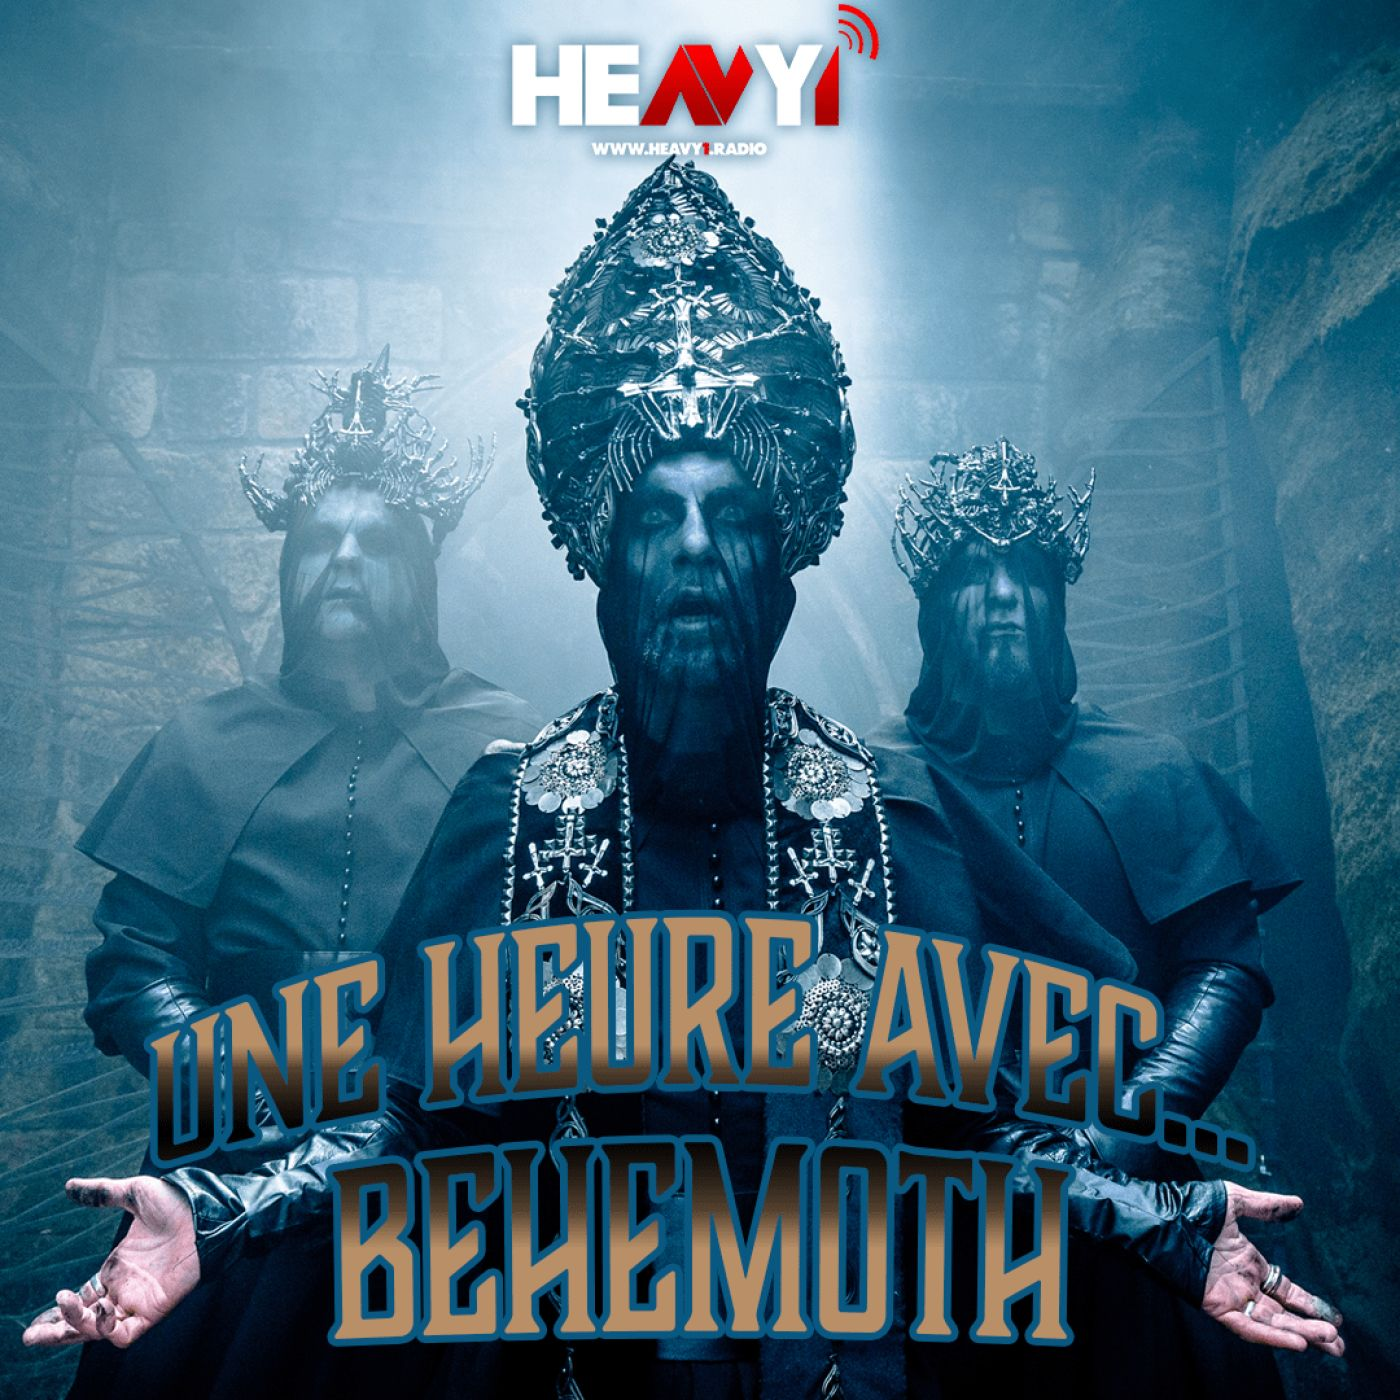 Une heure avec... Behemoth